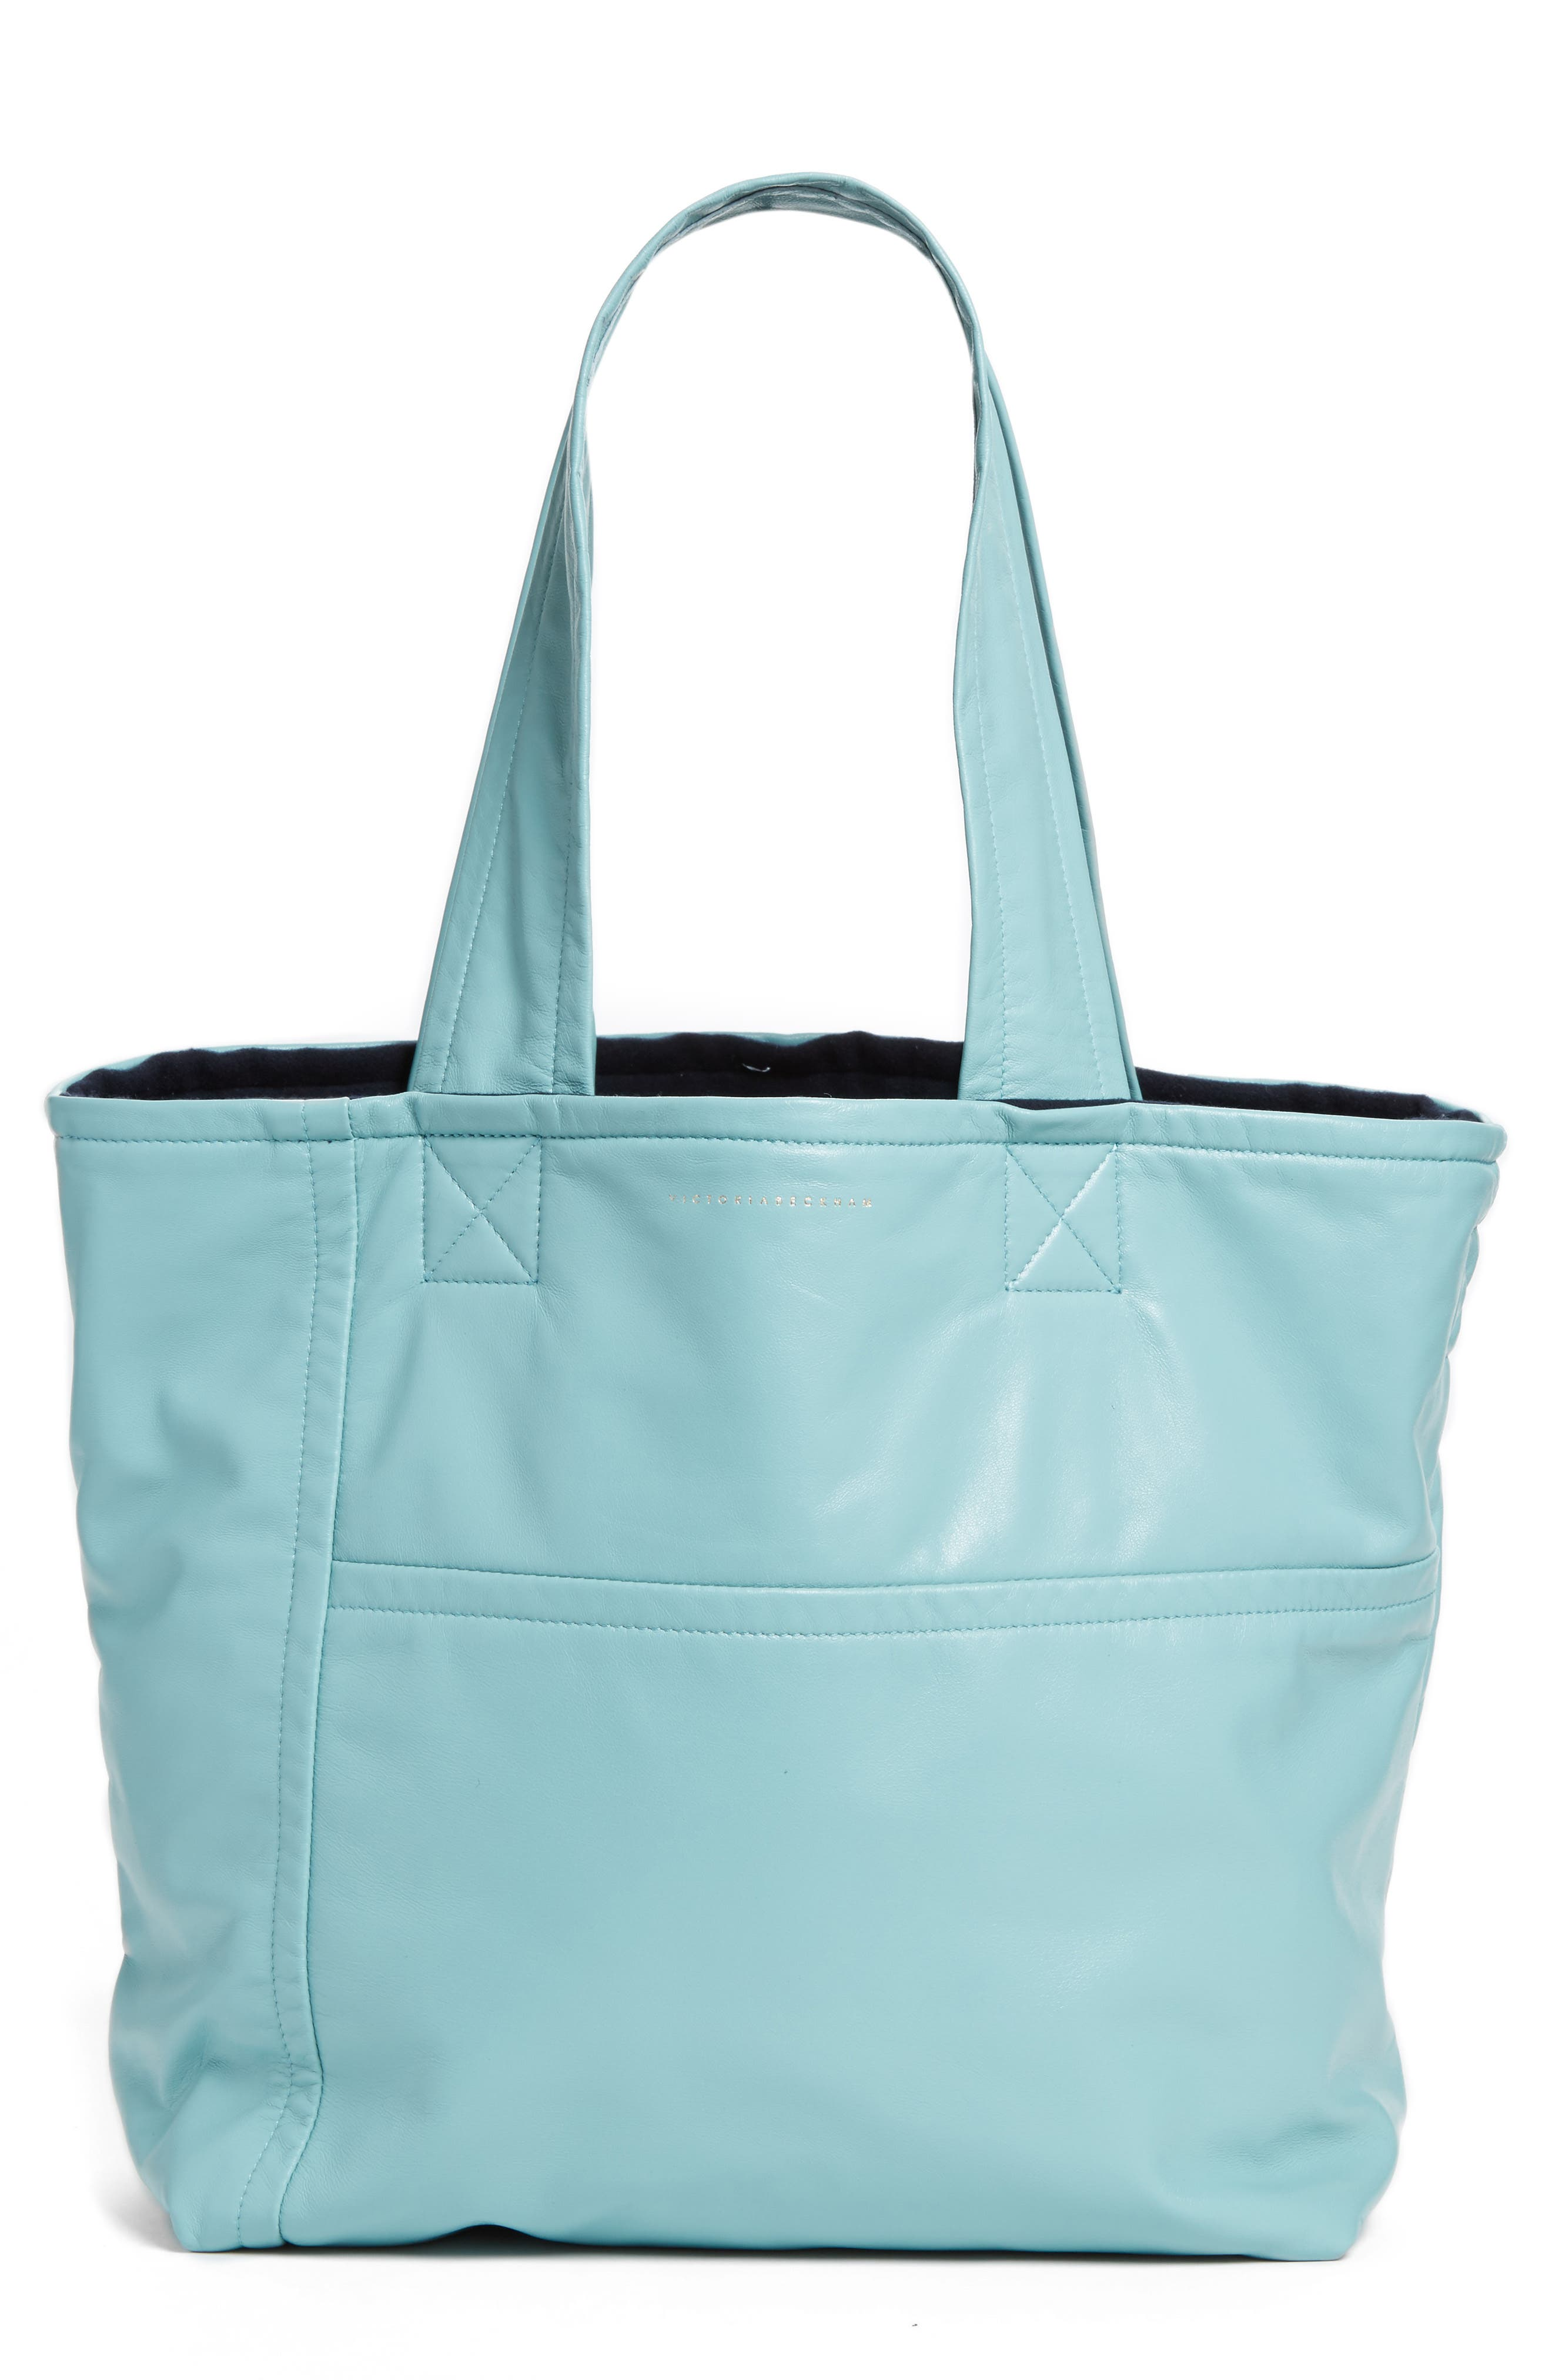 Victoria Beckham  SUNDAY BAG - BLUE/GREEN